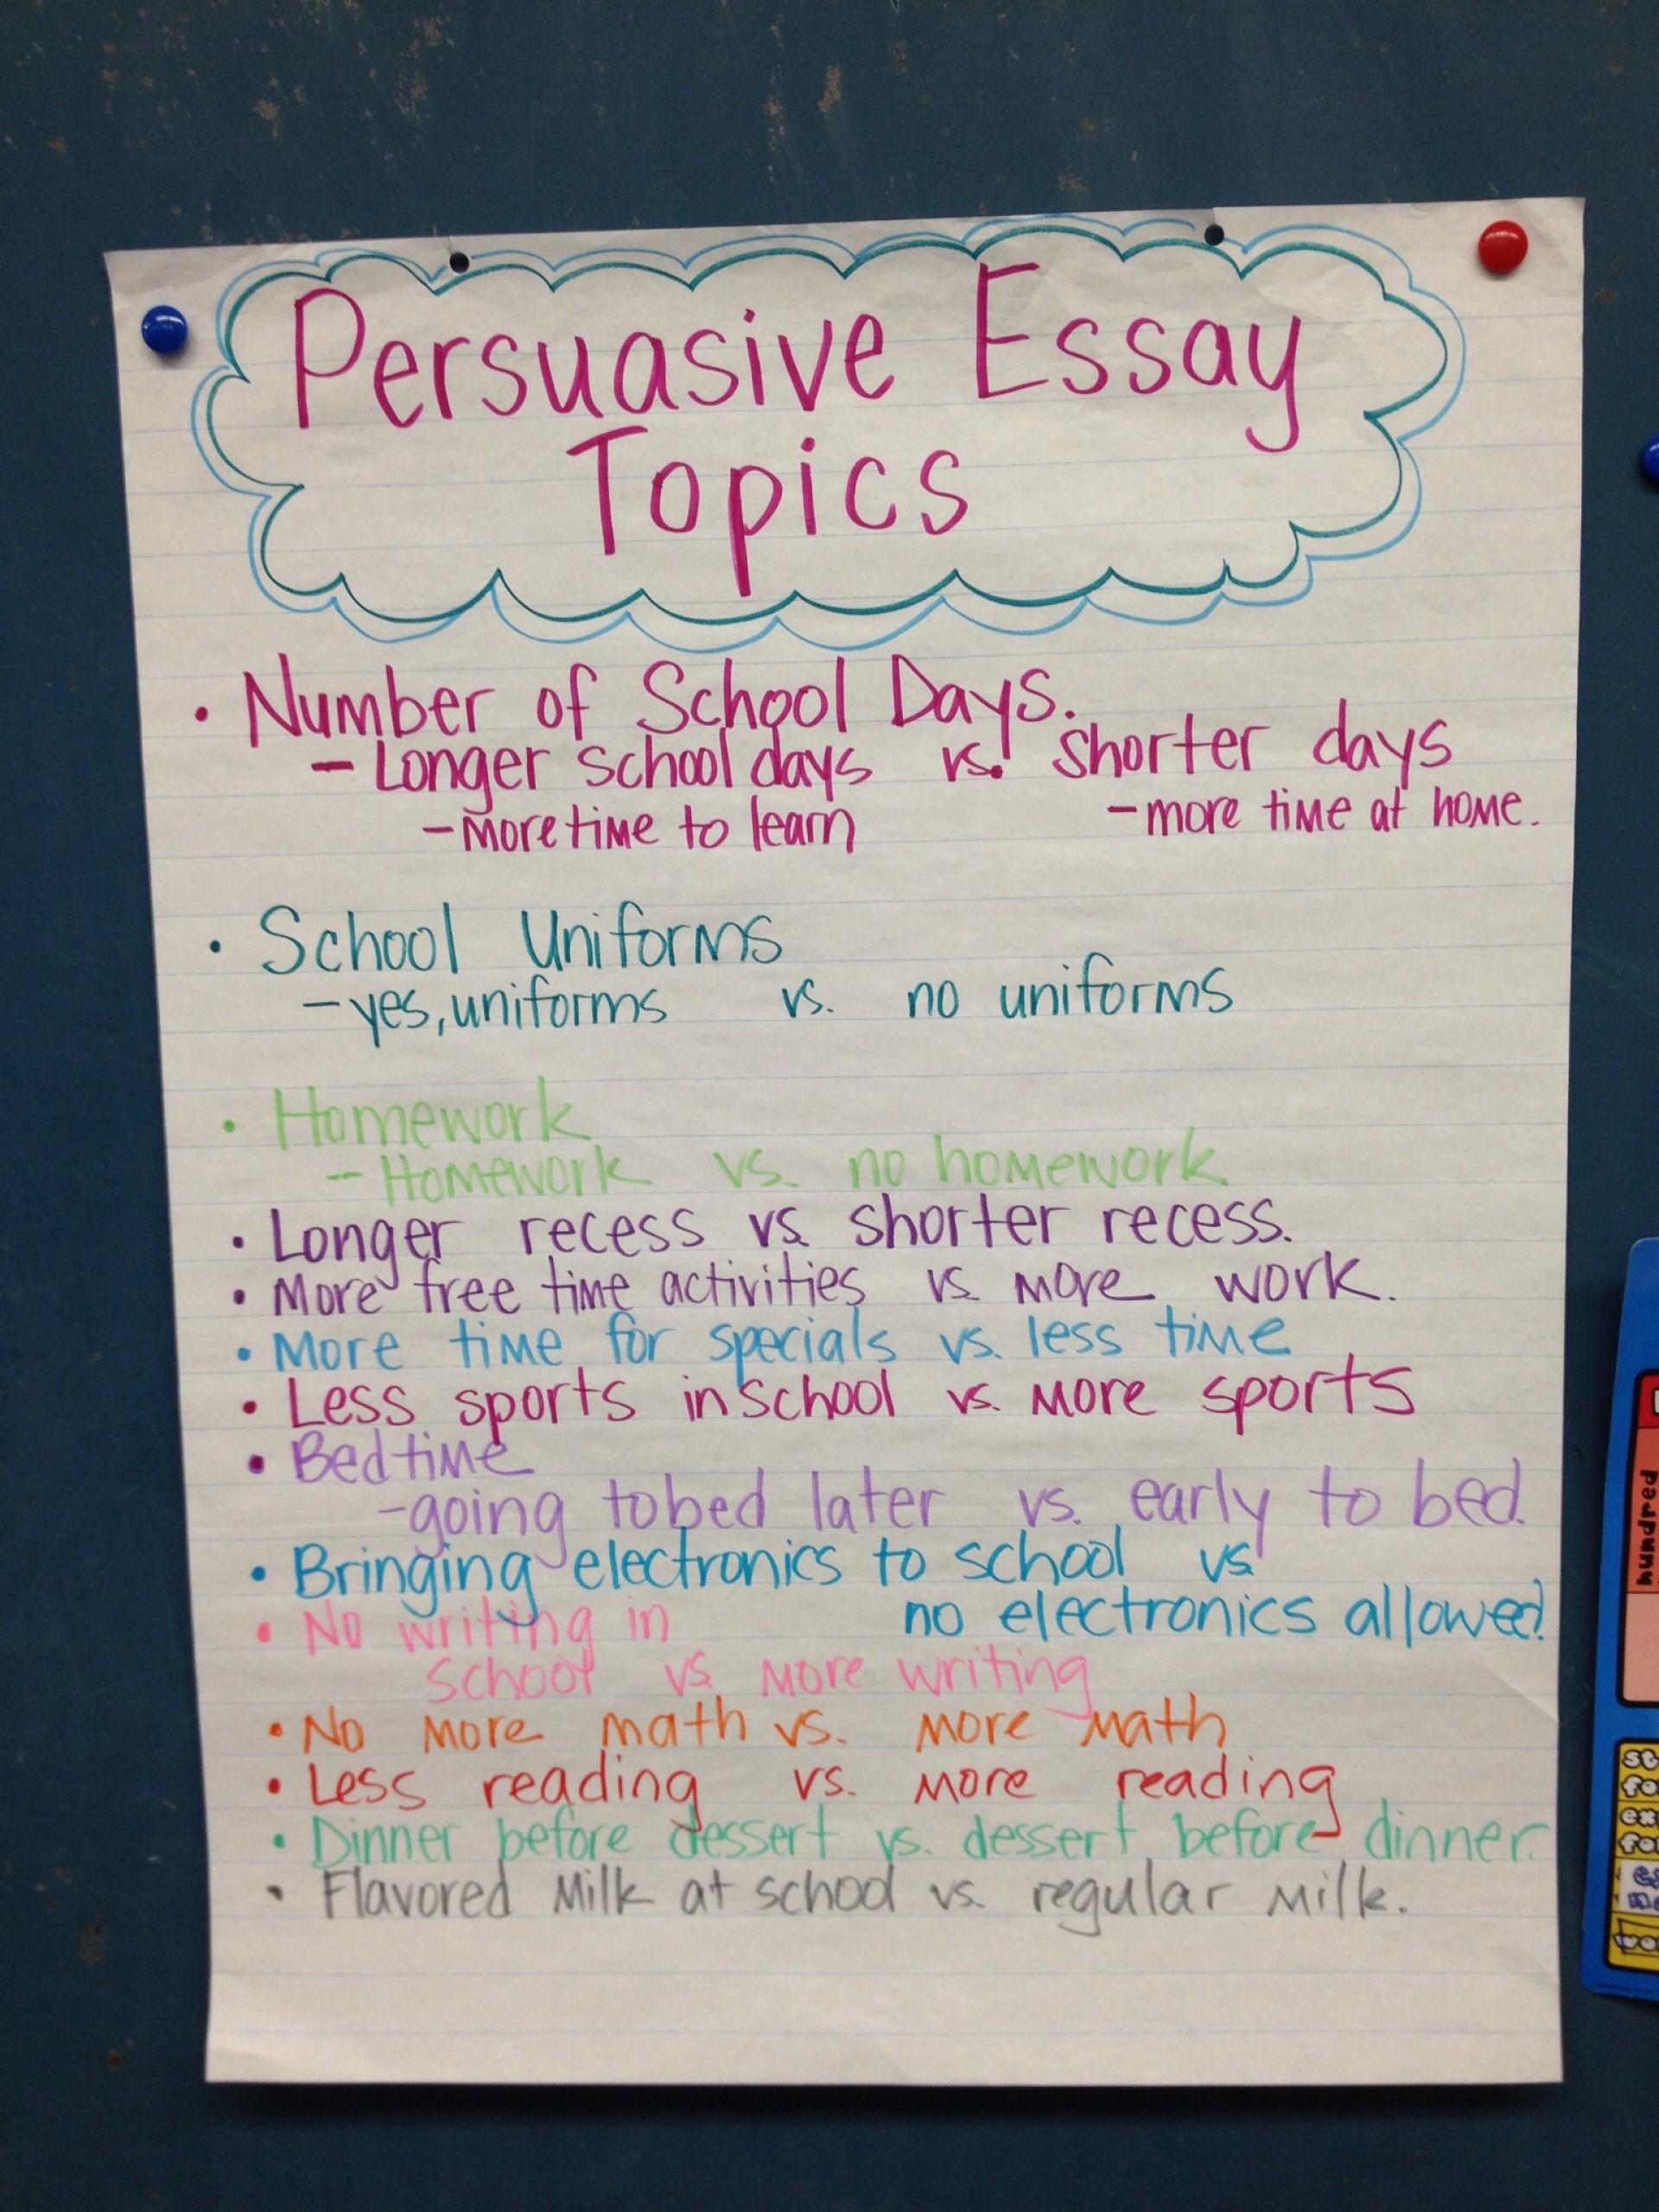 essay example best persuasive topics  thatsnotus   best persuasive essay topics example ideas of school daze pinterest  creative about rules lis argumentative